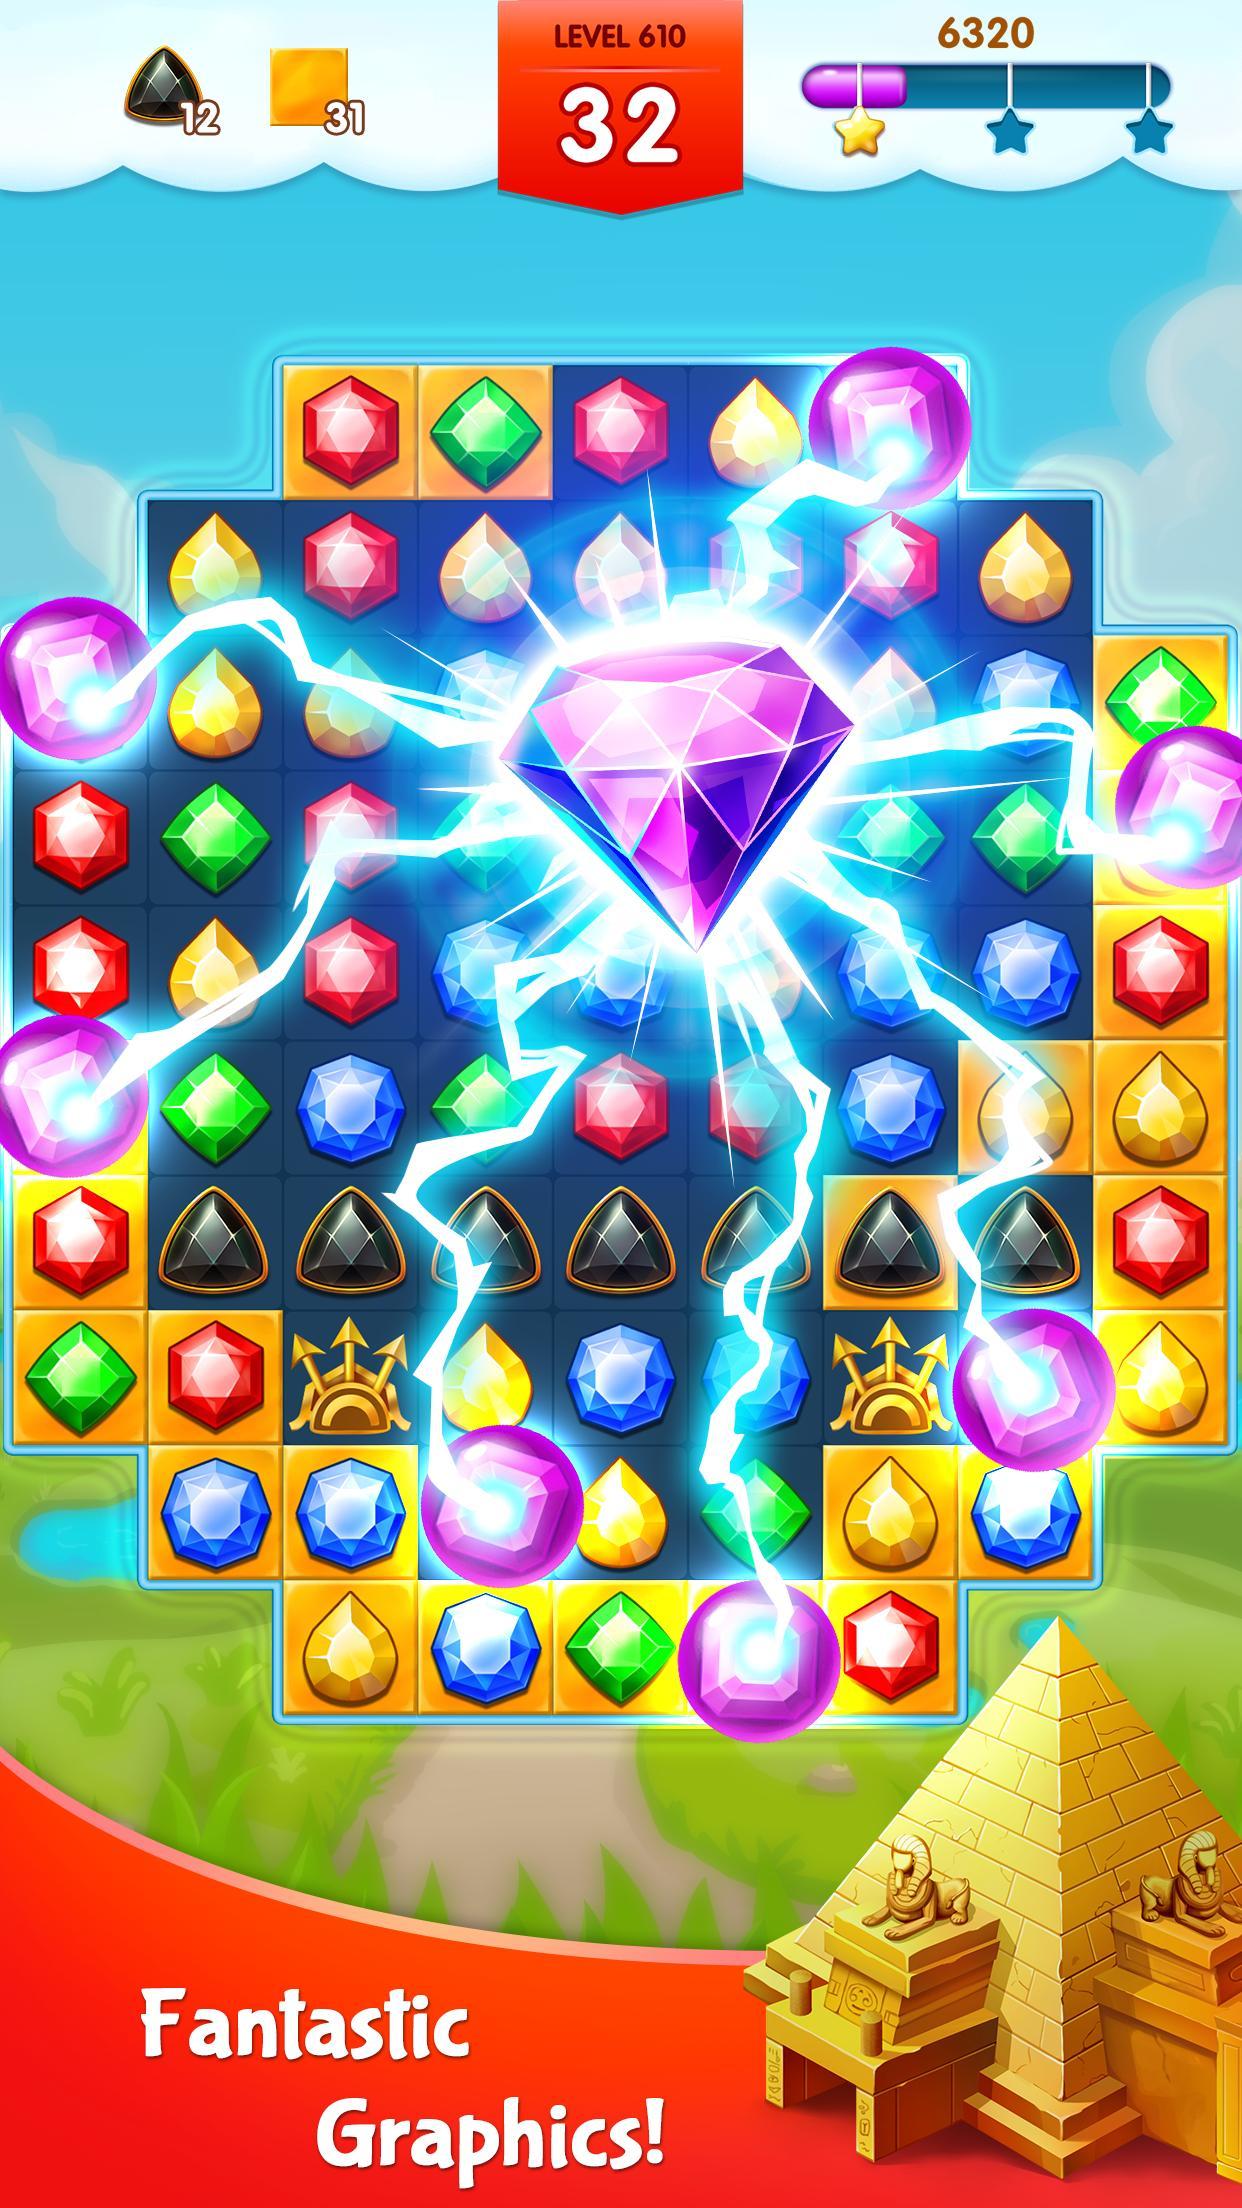 Jewels Legend - Match 3 Puzzle 2.33.3 Screenshot 3